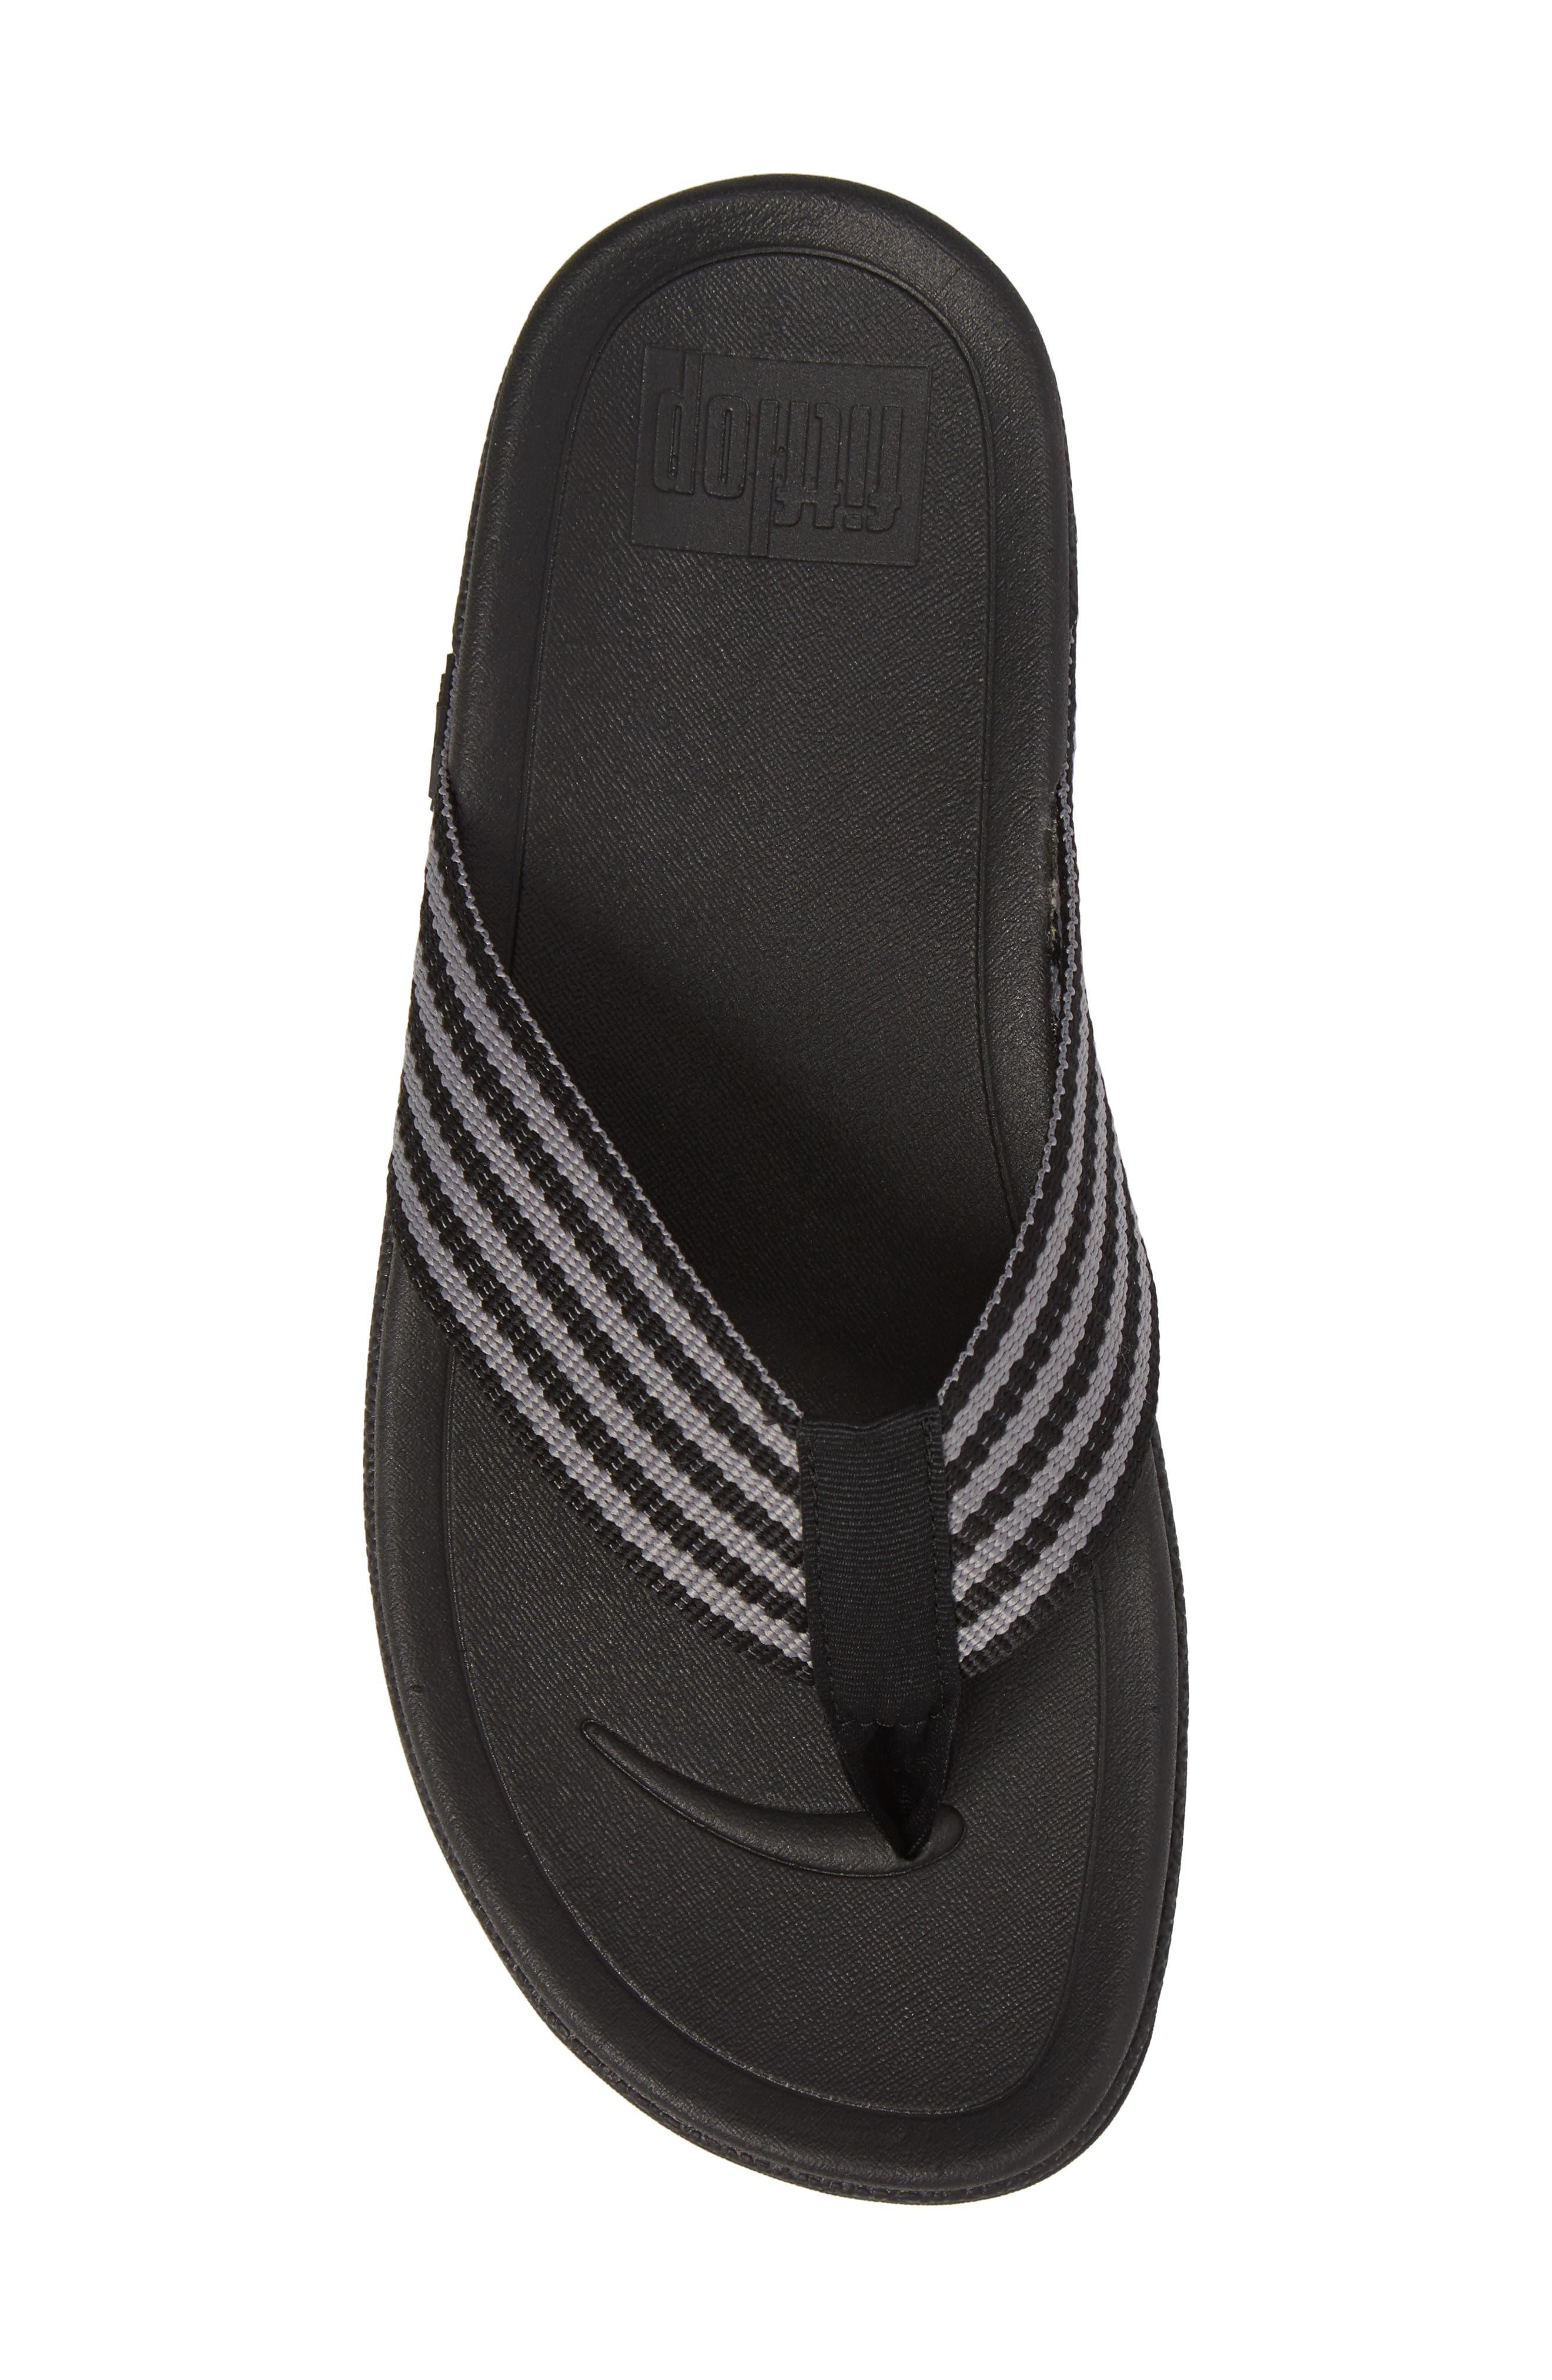 'Surfer' Flip Flop,                             Alternate thumbnail 5, color,                             Black / Grey